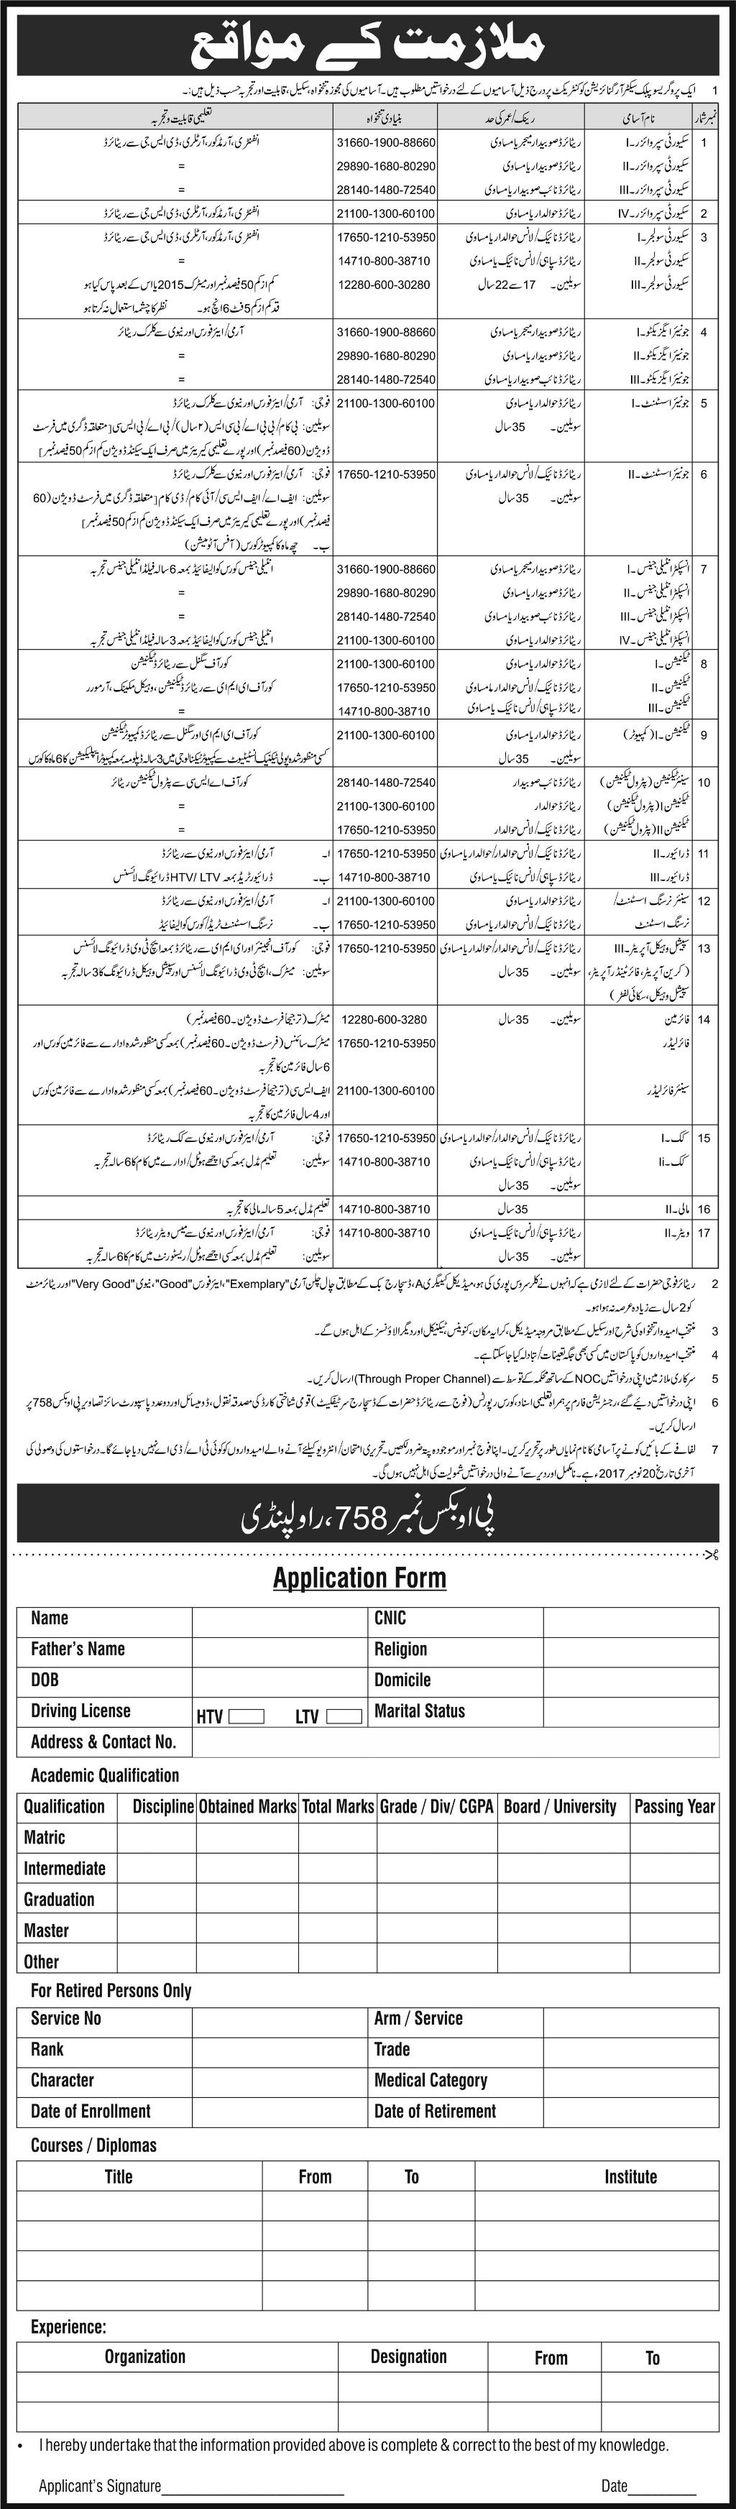 PO Box 758 Rawalpindi Jobs 30 October 2017 in Pakistan Army Application Form Download Advertisement Latest. Pakistan Army Jobs 2017 PO Box